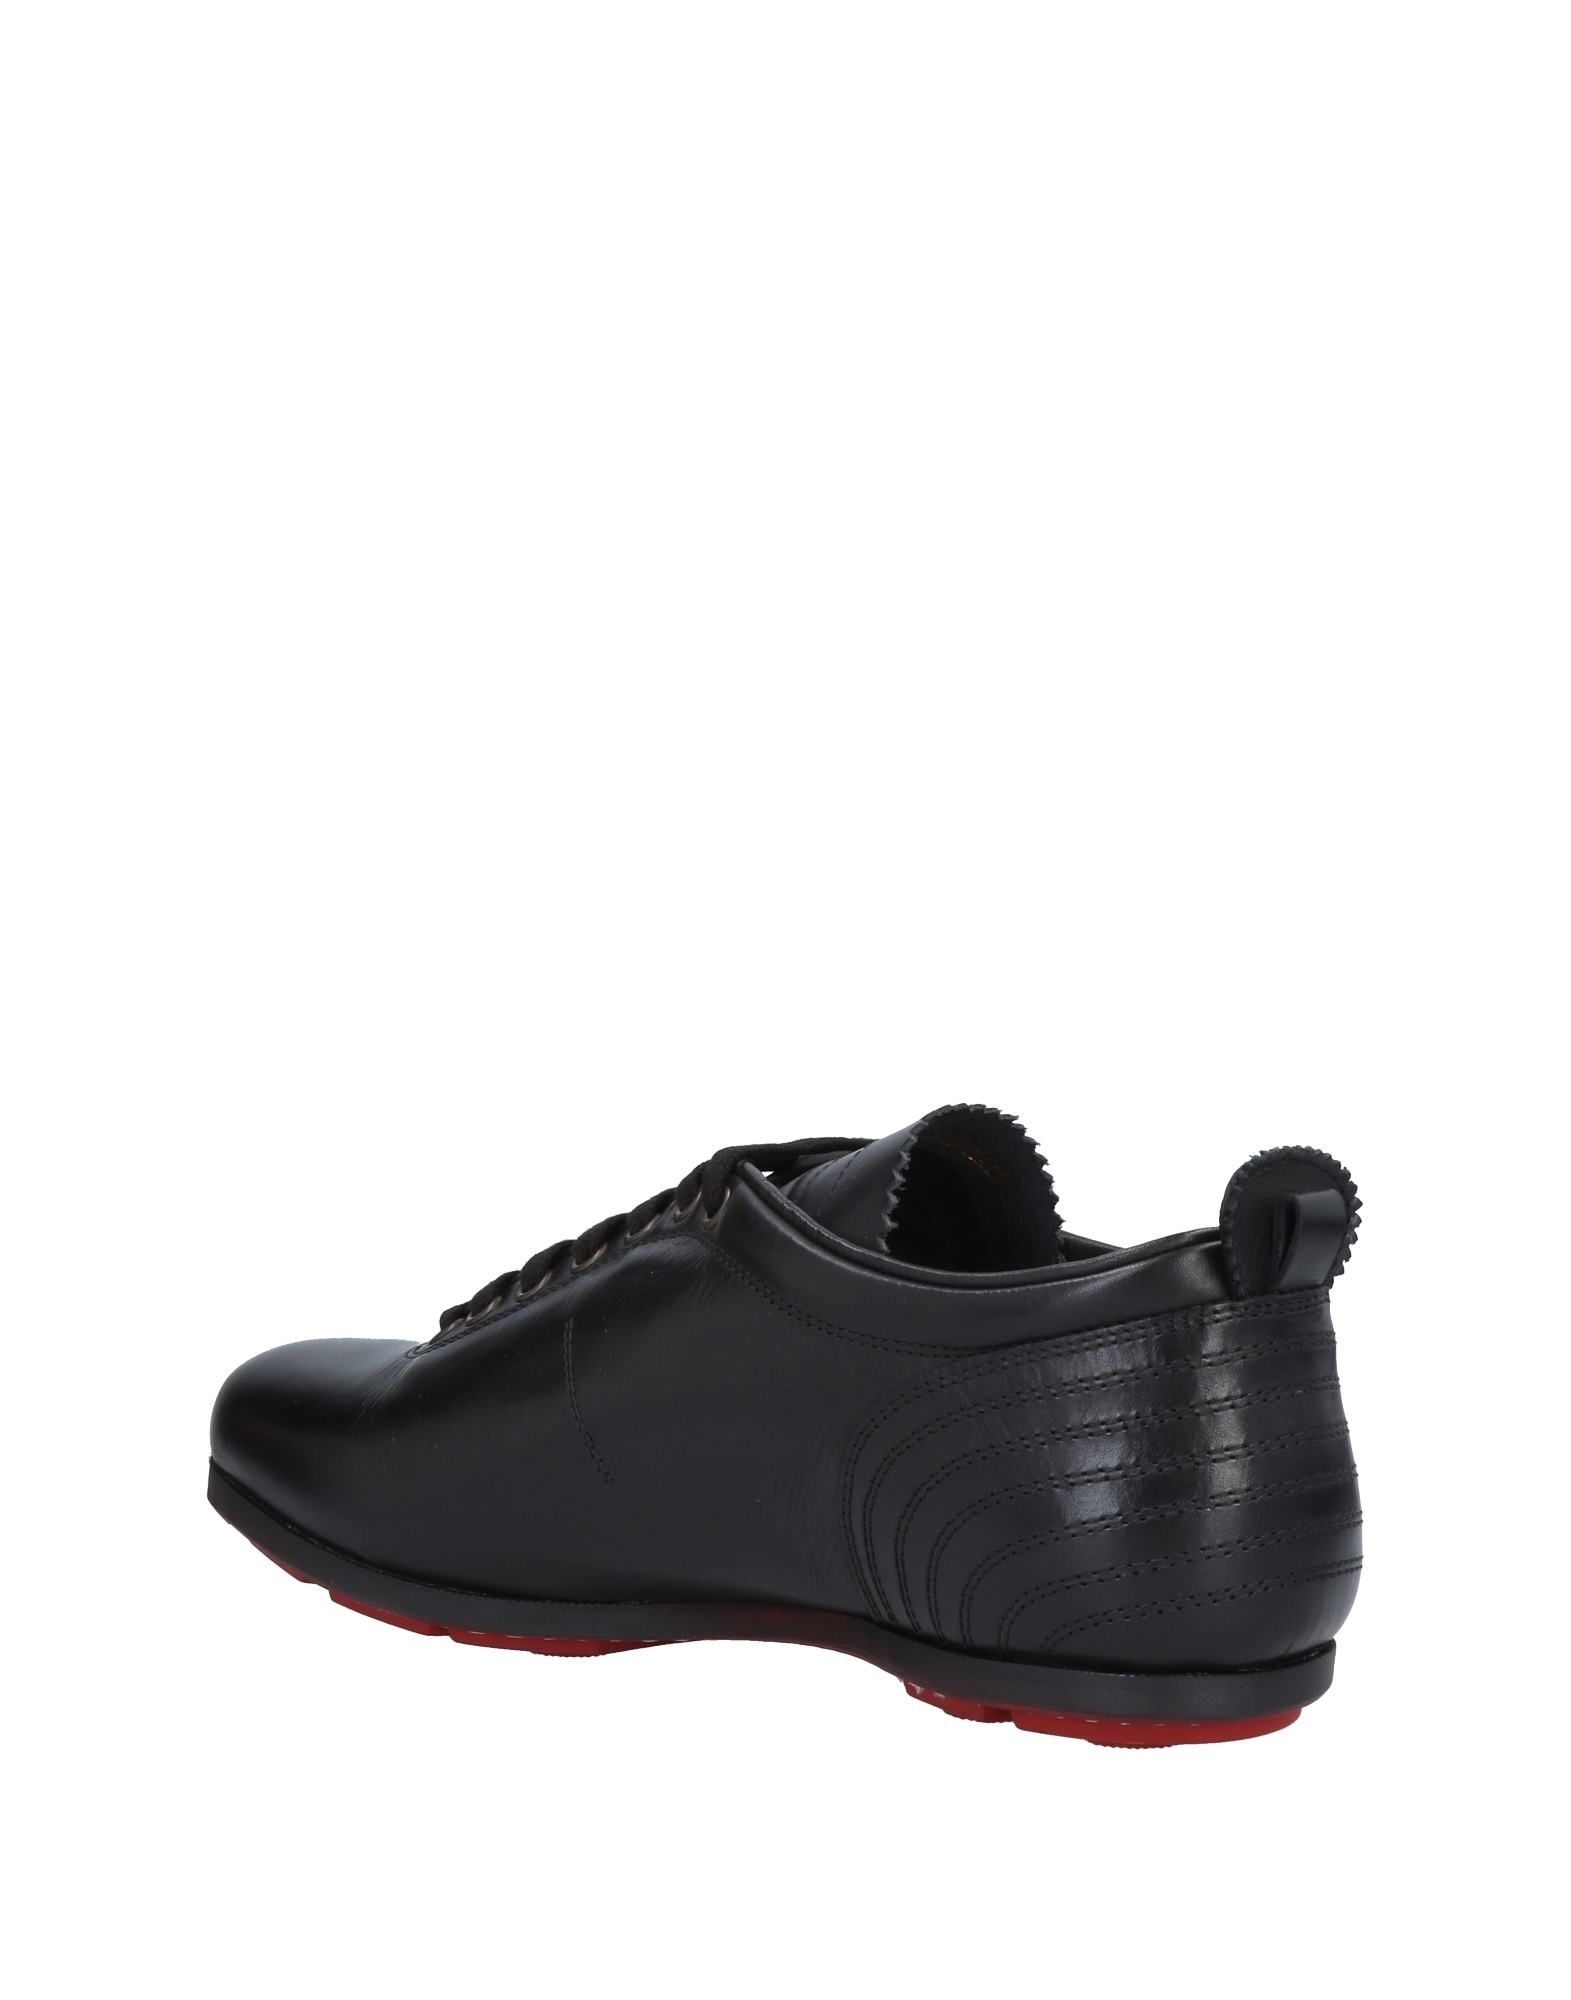 Tombolini Sneakers - Men Tombolini Tombolini Tombolini Sneakers online on  United Kingdom - 11469262VC ec10ce